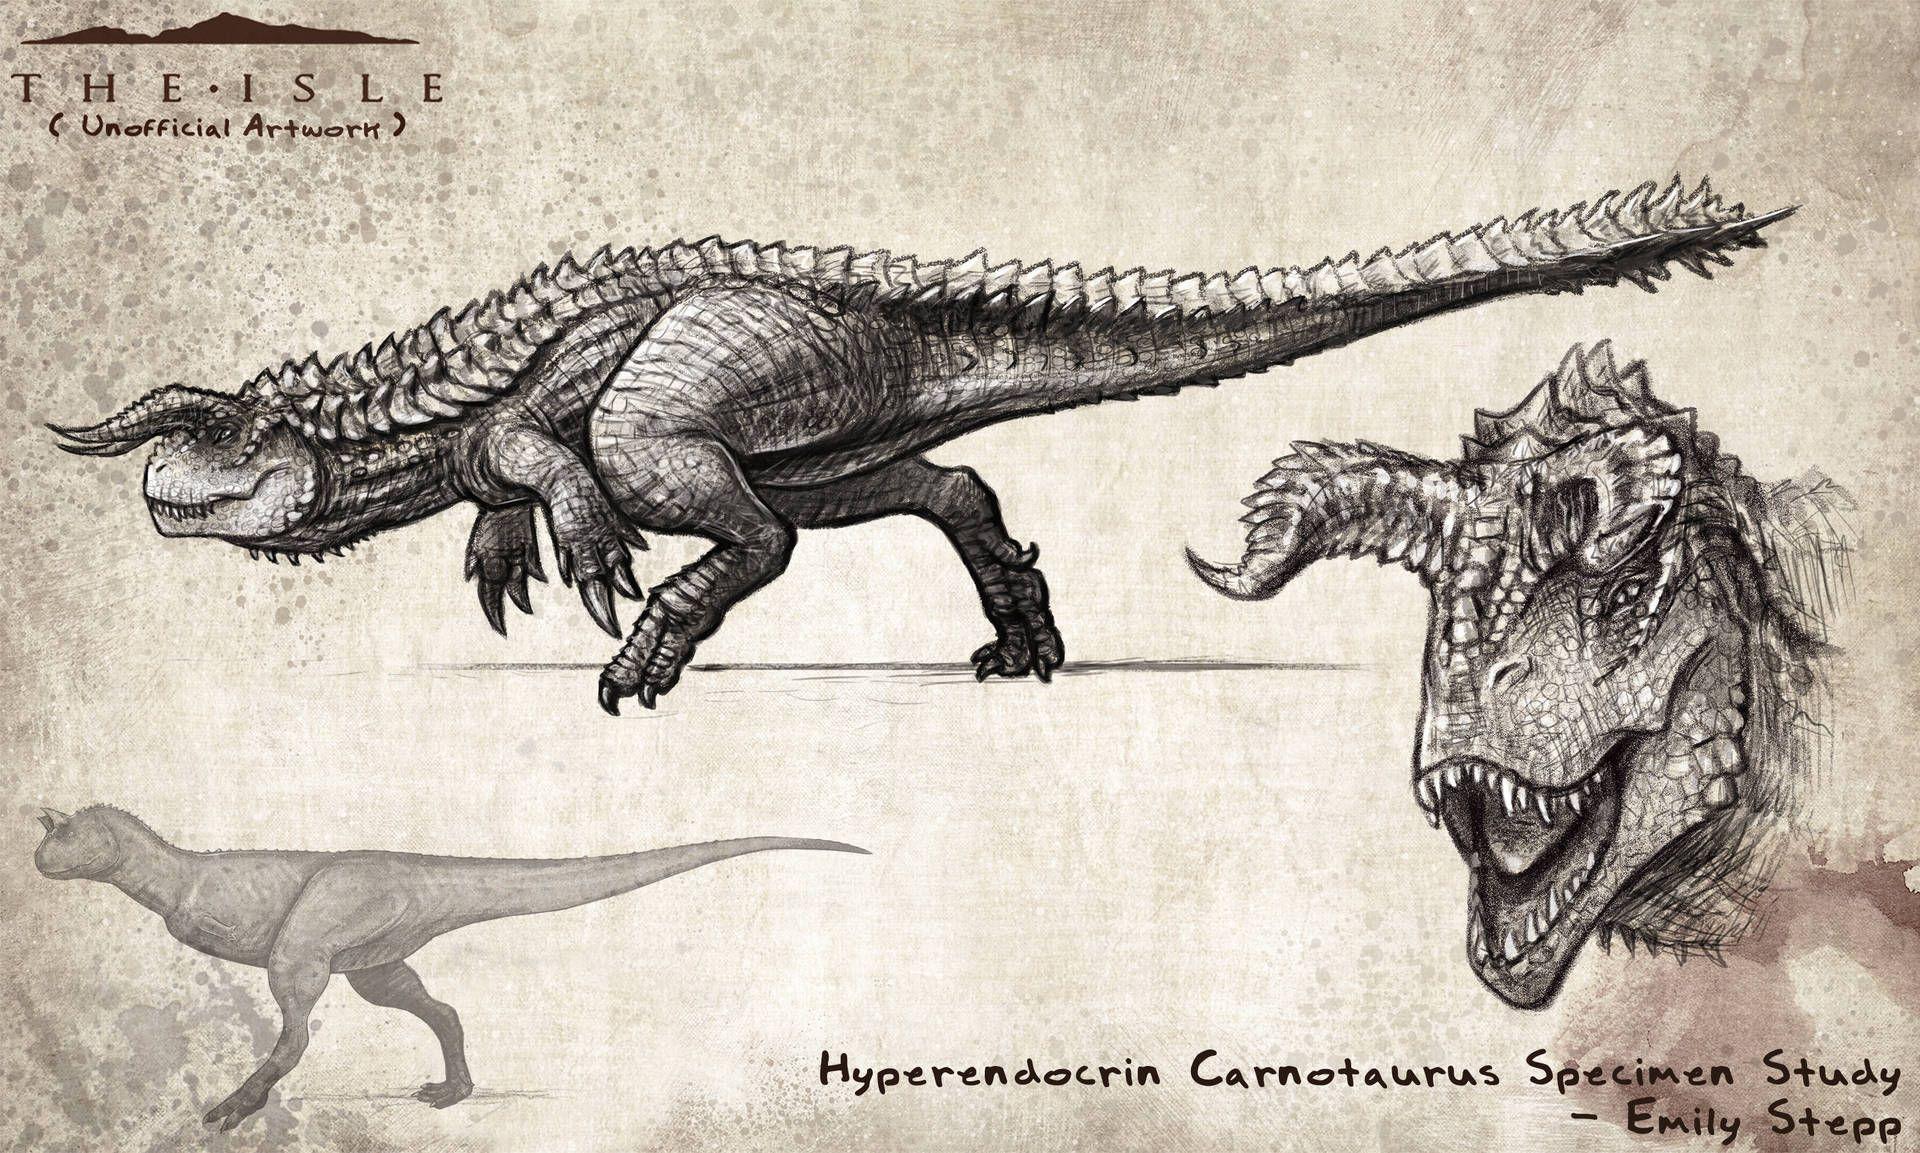 Hyperendocrin Carnotaurus Study by EmilyStepp #dinosaurart